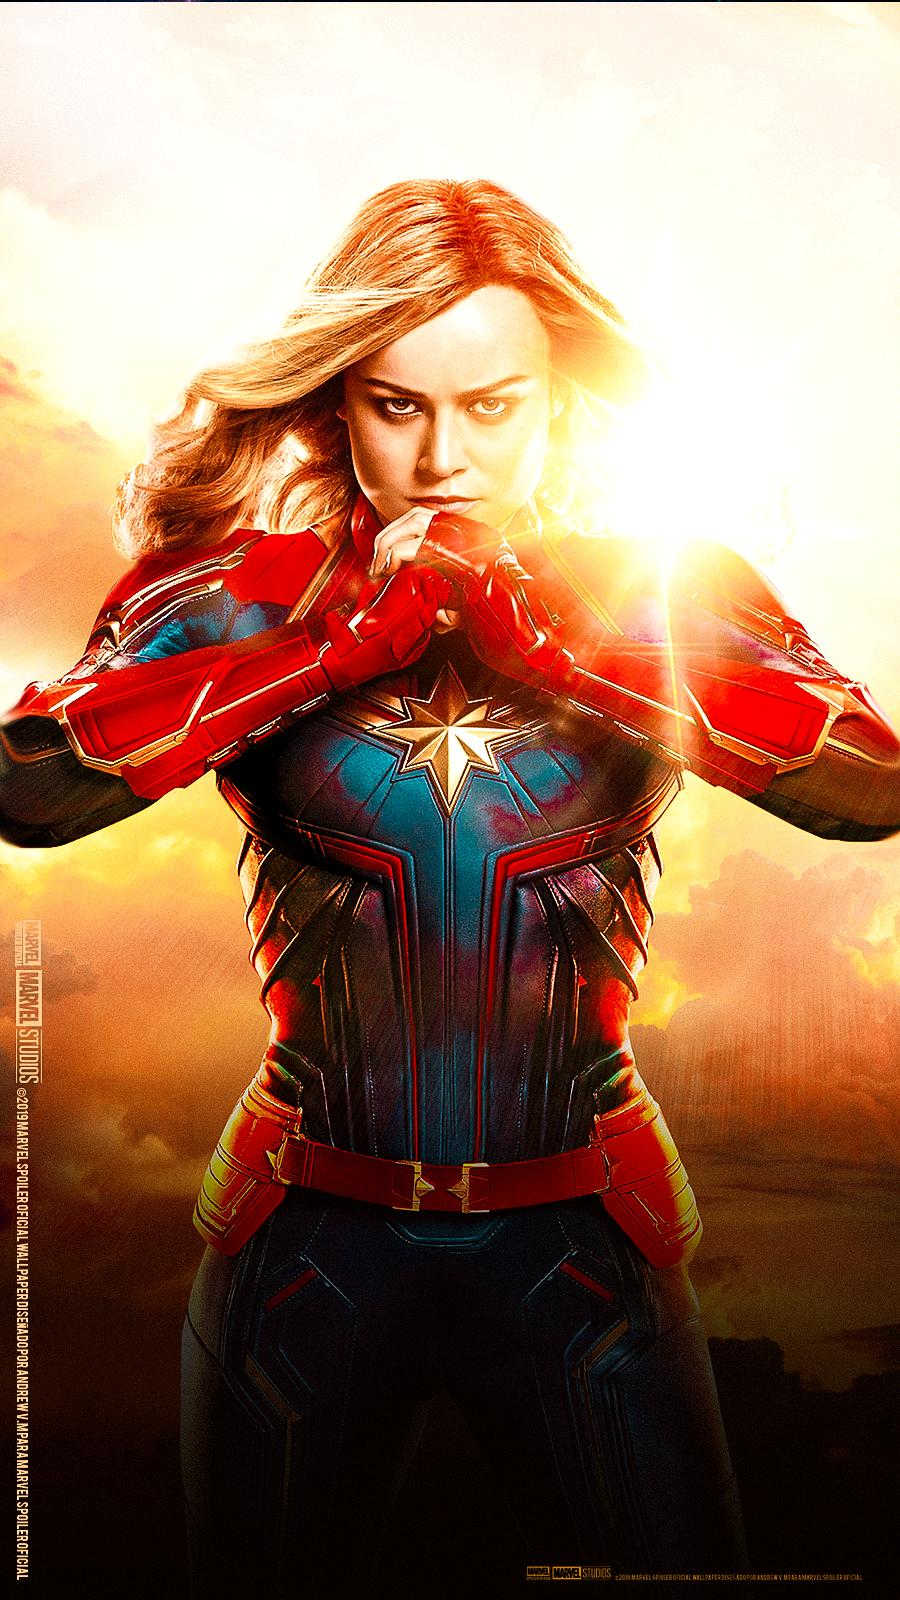 Captain Marvel Wallpaper Hd Captain Marvel 94750 Hd Wallpaper Backgrounds Download